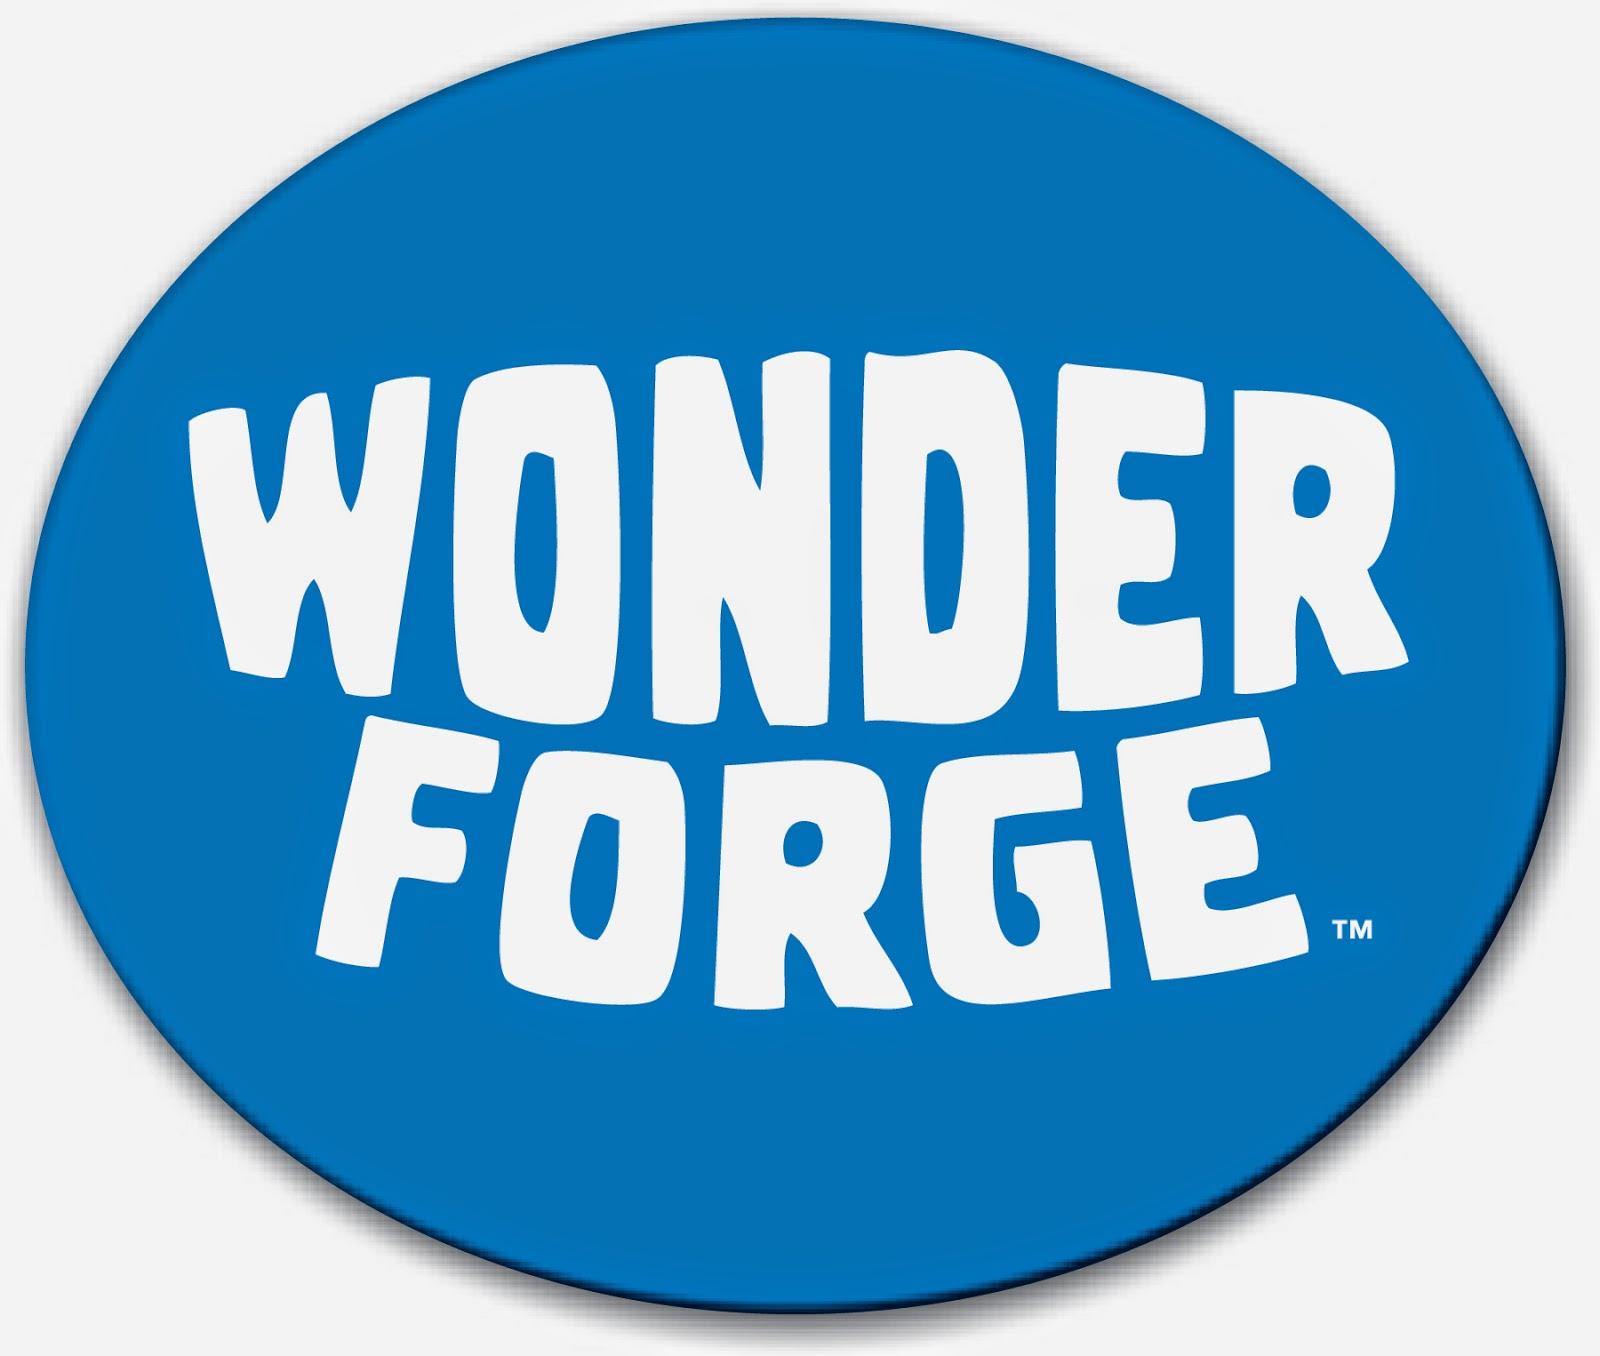 http://www.wonderforge.com/